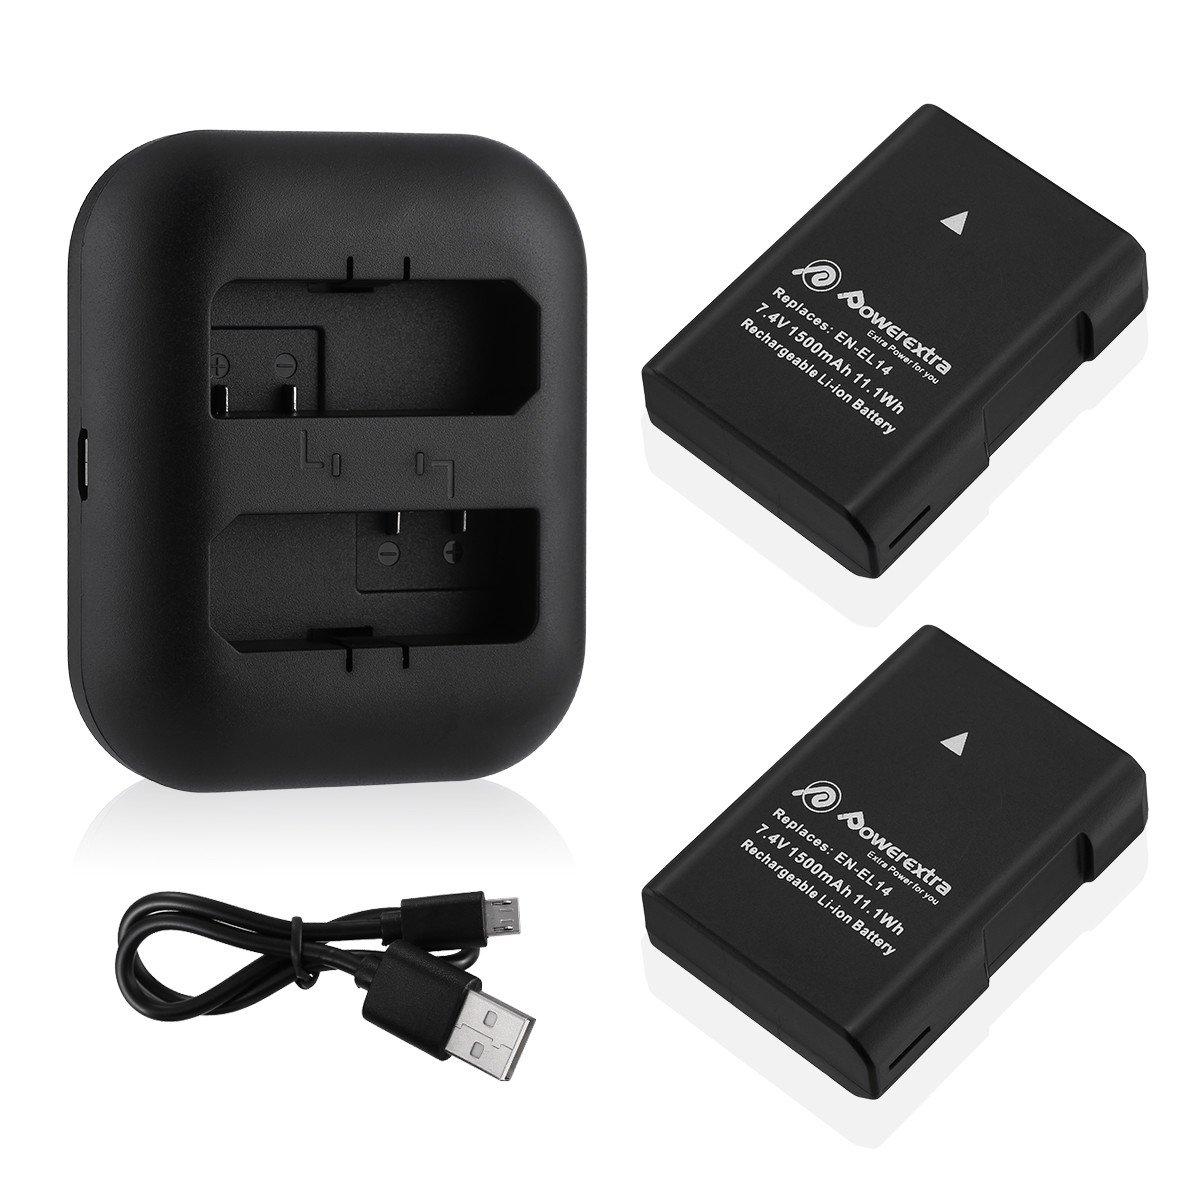 Powerextra 2パック交換用バッテリーとデュアルバッテリー充電器for Nikon en-el14、en-el14 a、Nikon p7000 , p7100 , p7700 , p7800 , d3100 , d3200 , d3300 , d5100 , d5200 , d5300 , DF B01N6KVZL3